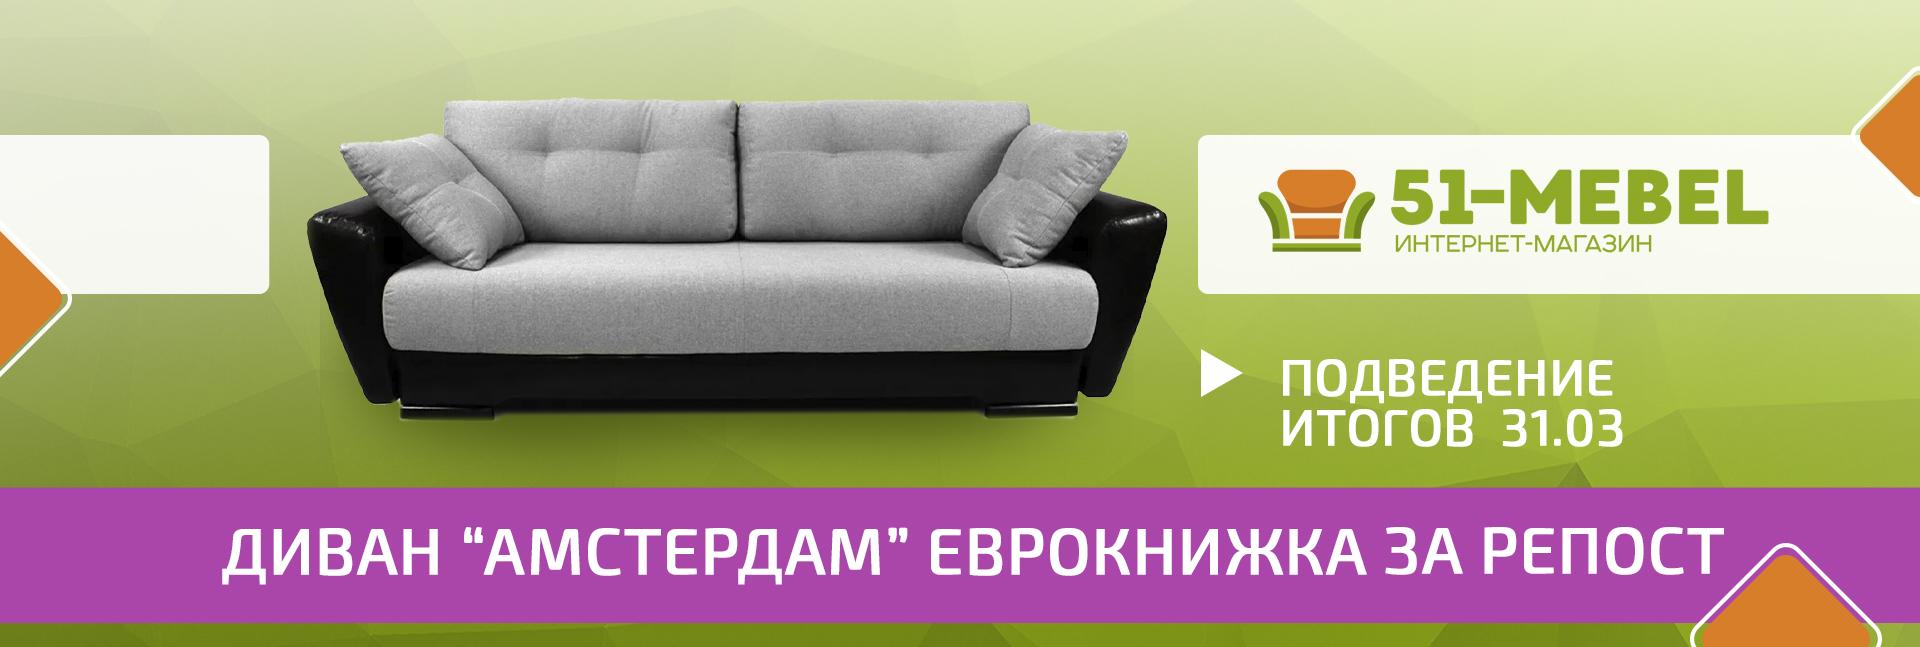 catalog/_banners/_репост_АМСТЕРДАМ.jpg